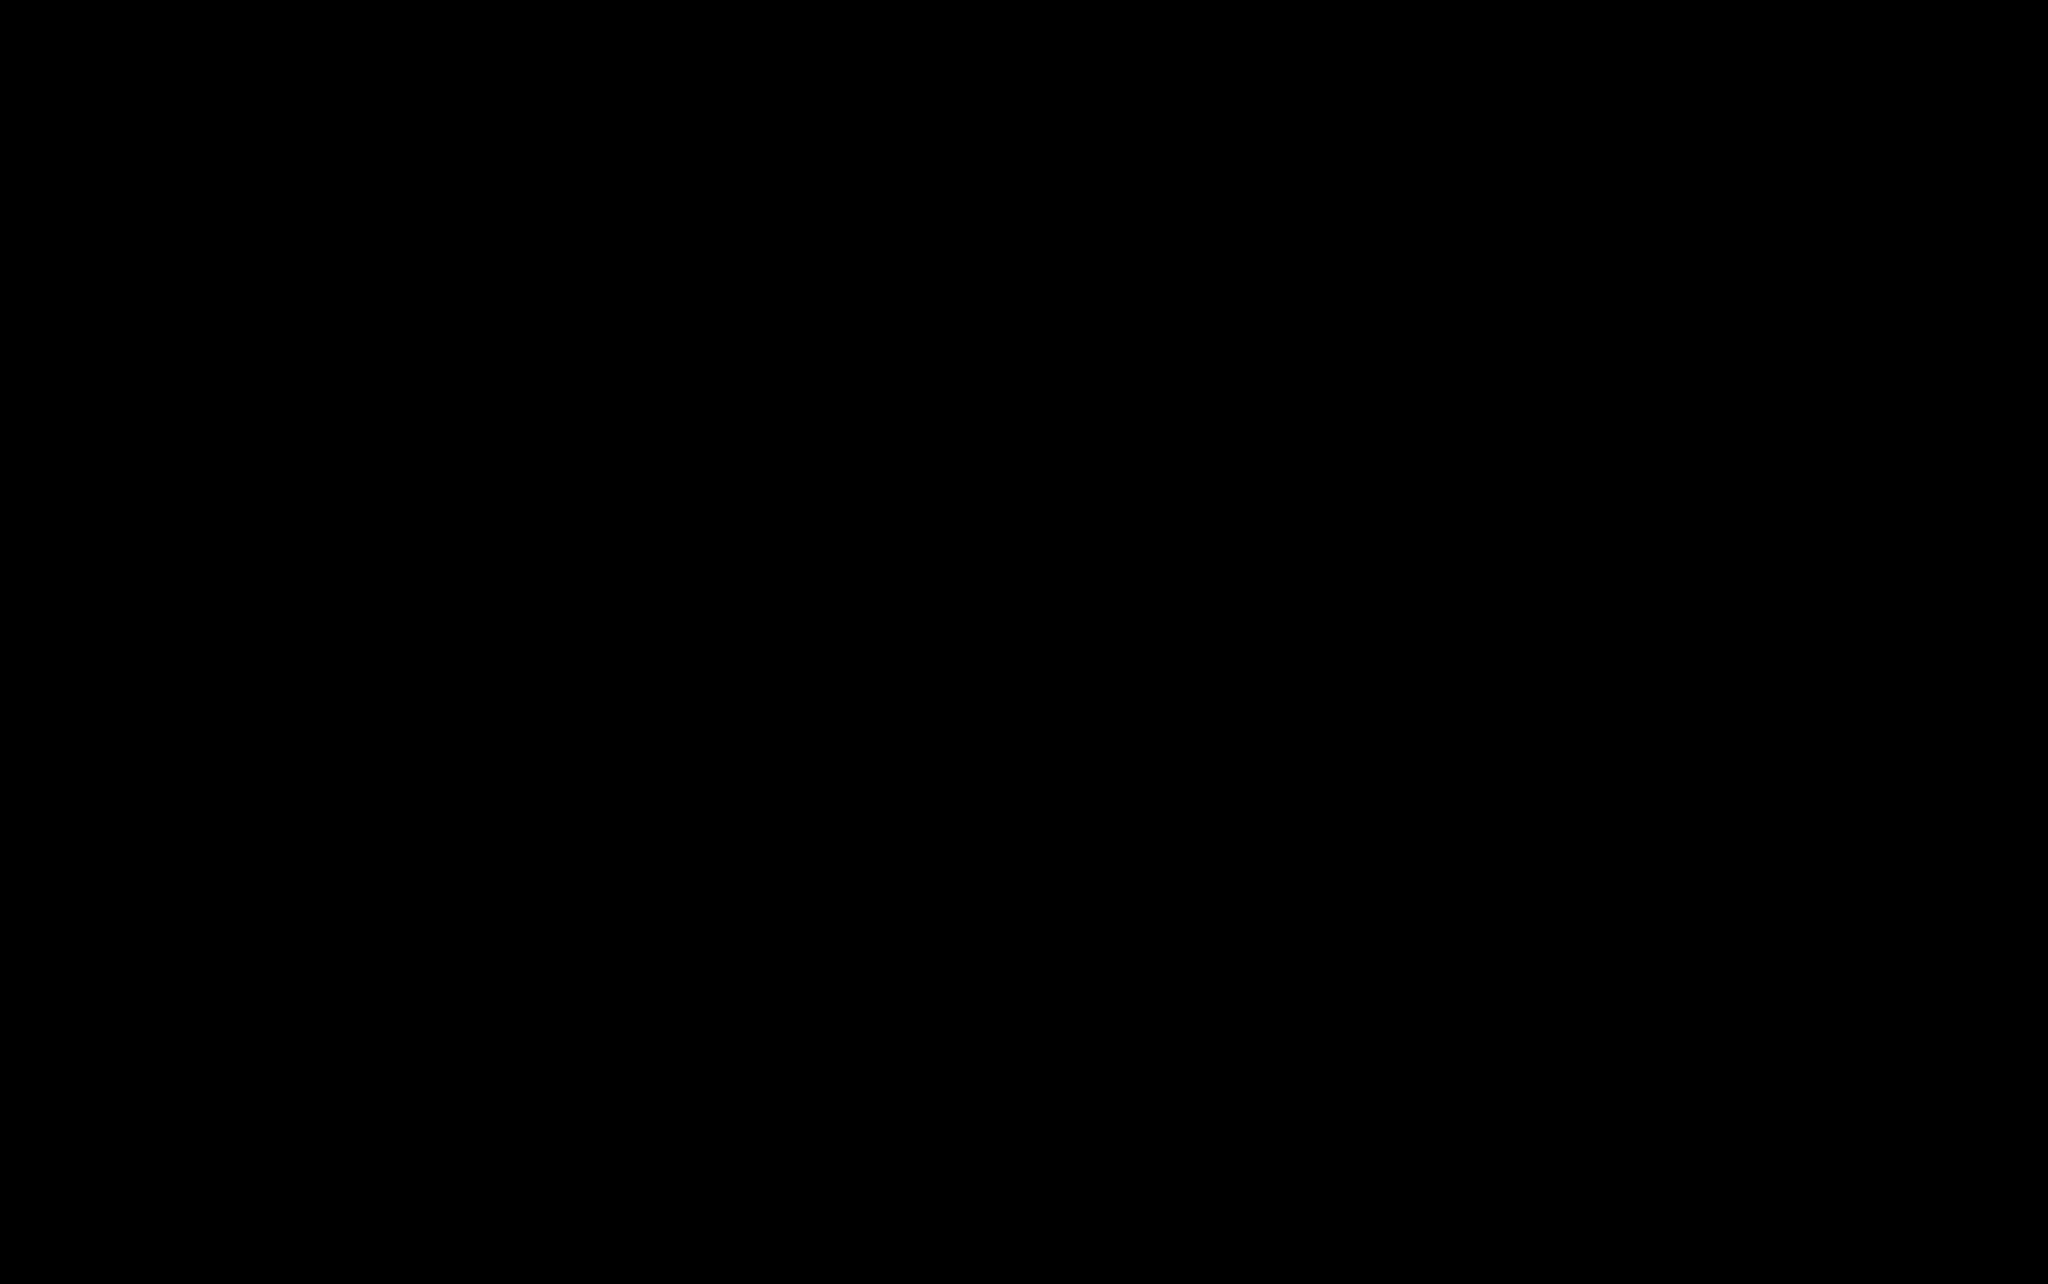 WordPress.com – ZĽAVA 20%